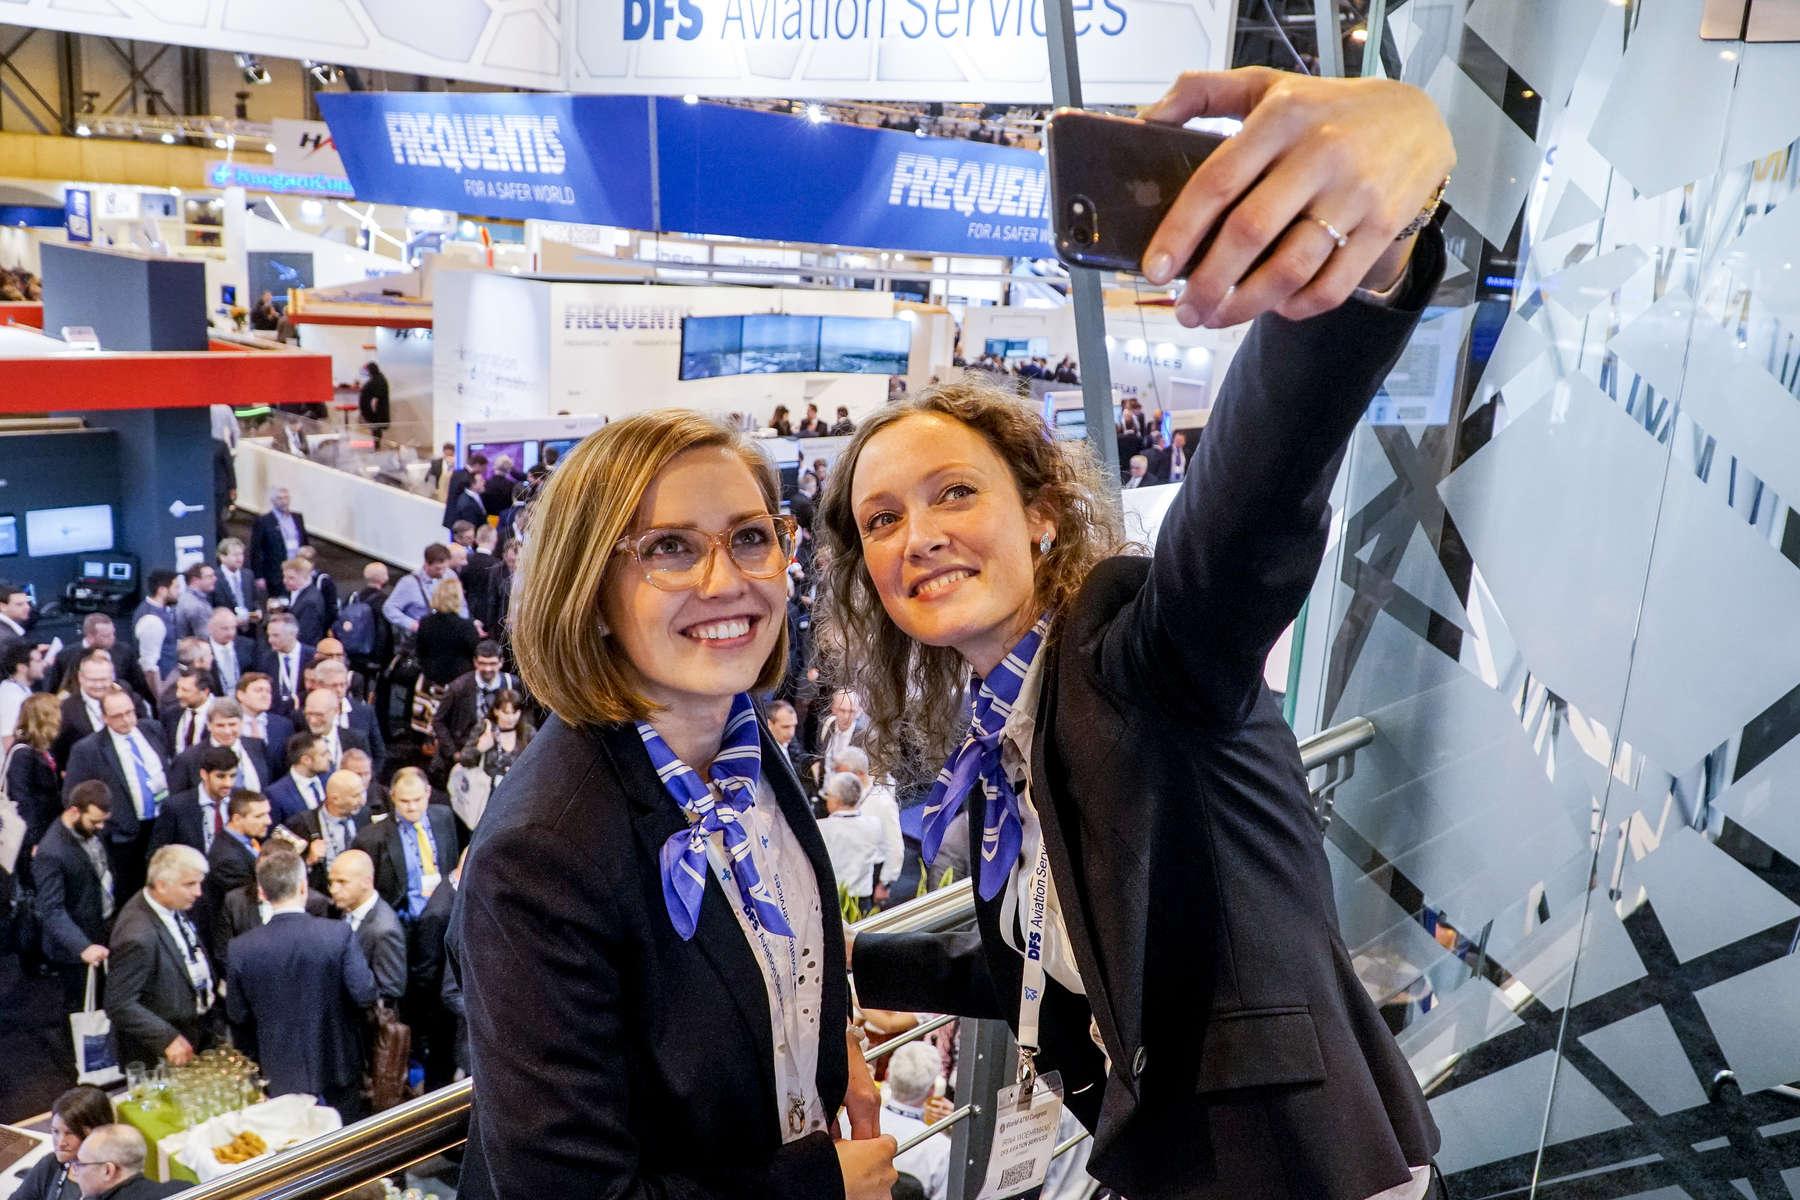 Carolin Walaski and Irina Woehrmann take a selfie at the DFS Aviation Services booth reception.